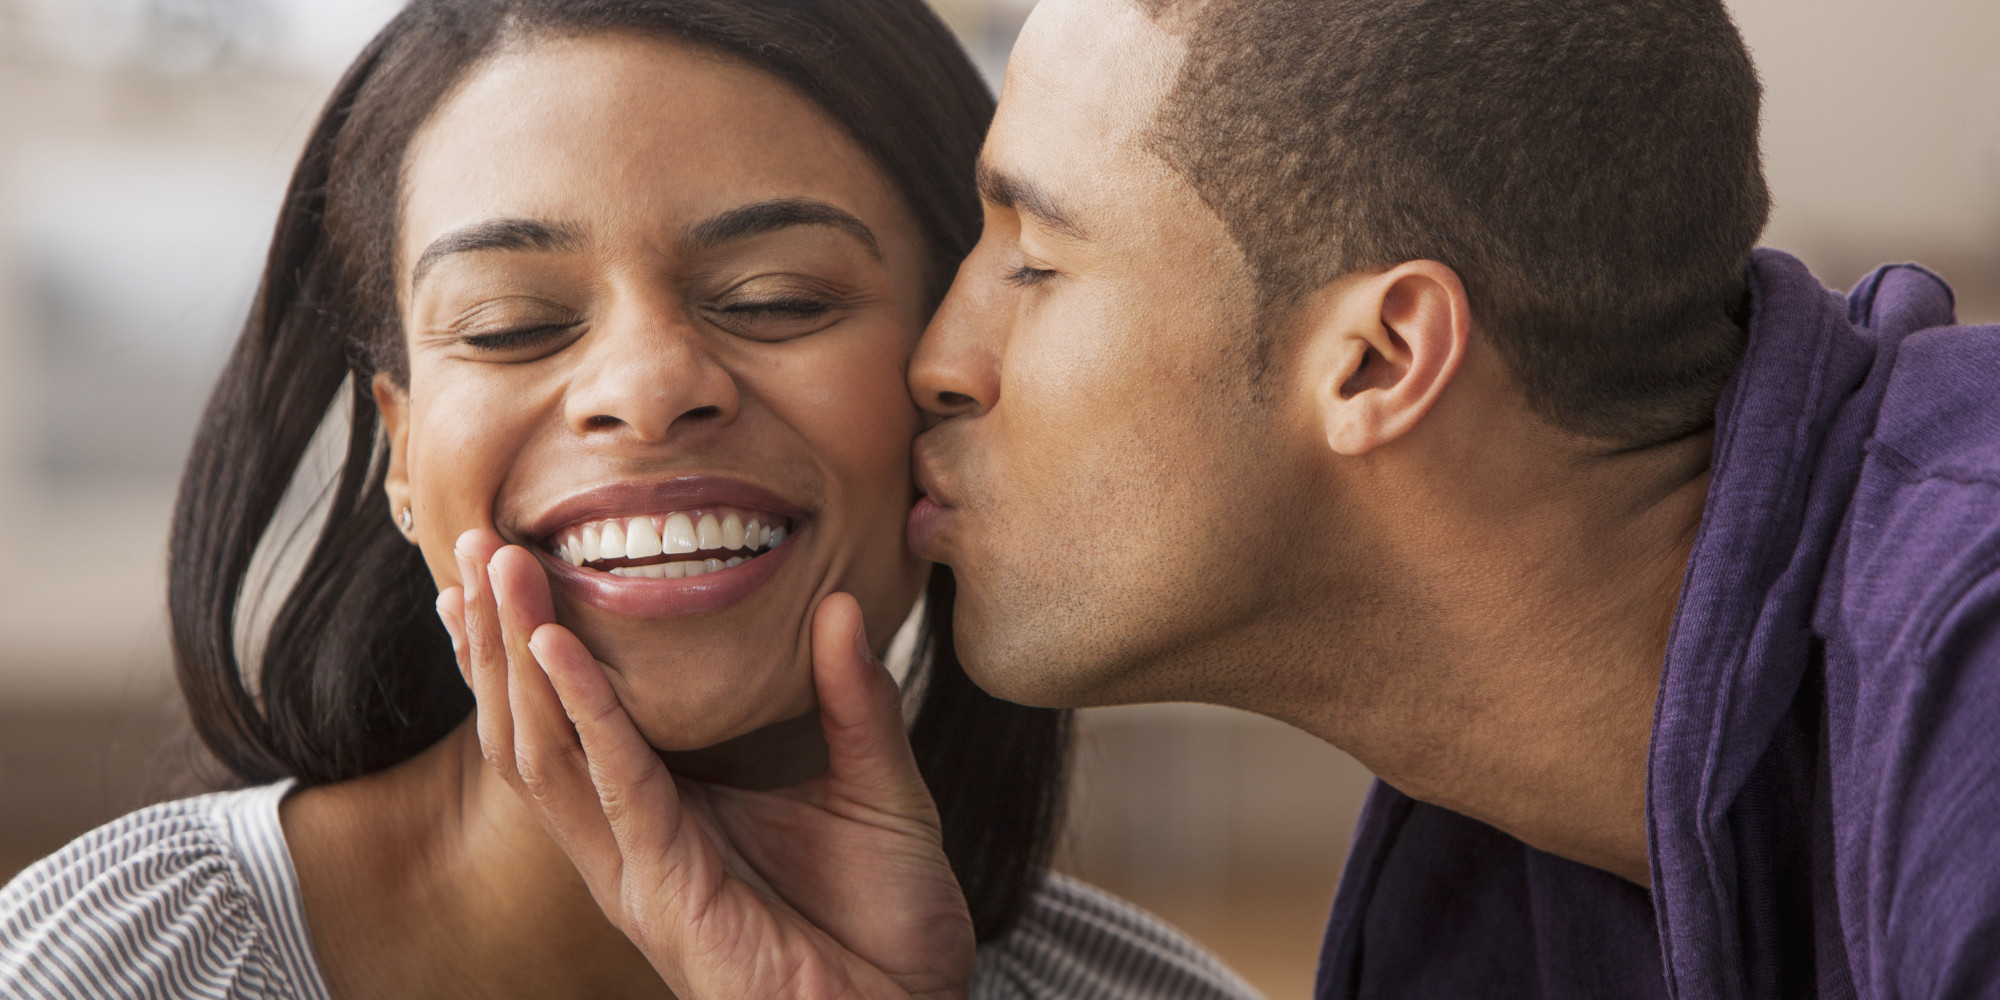 Black People Kissing